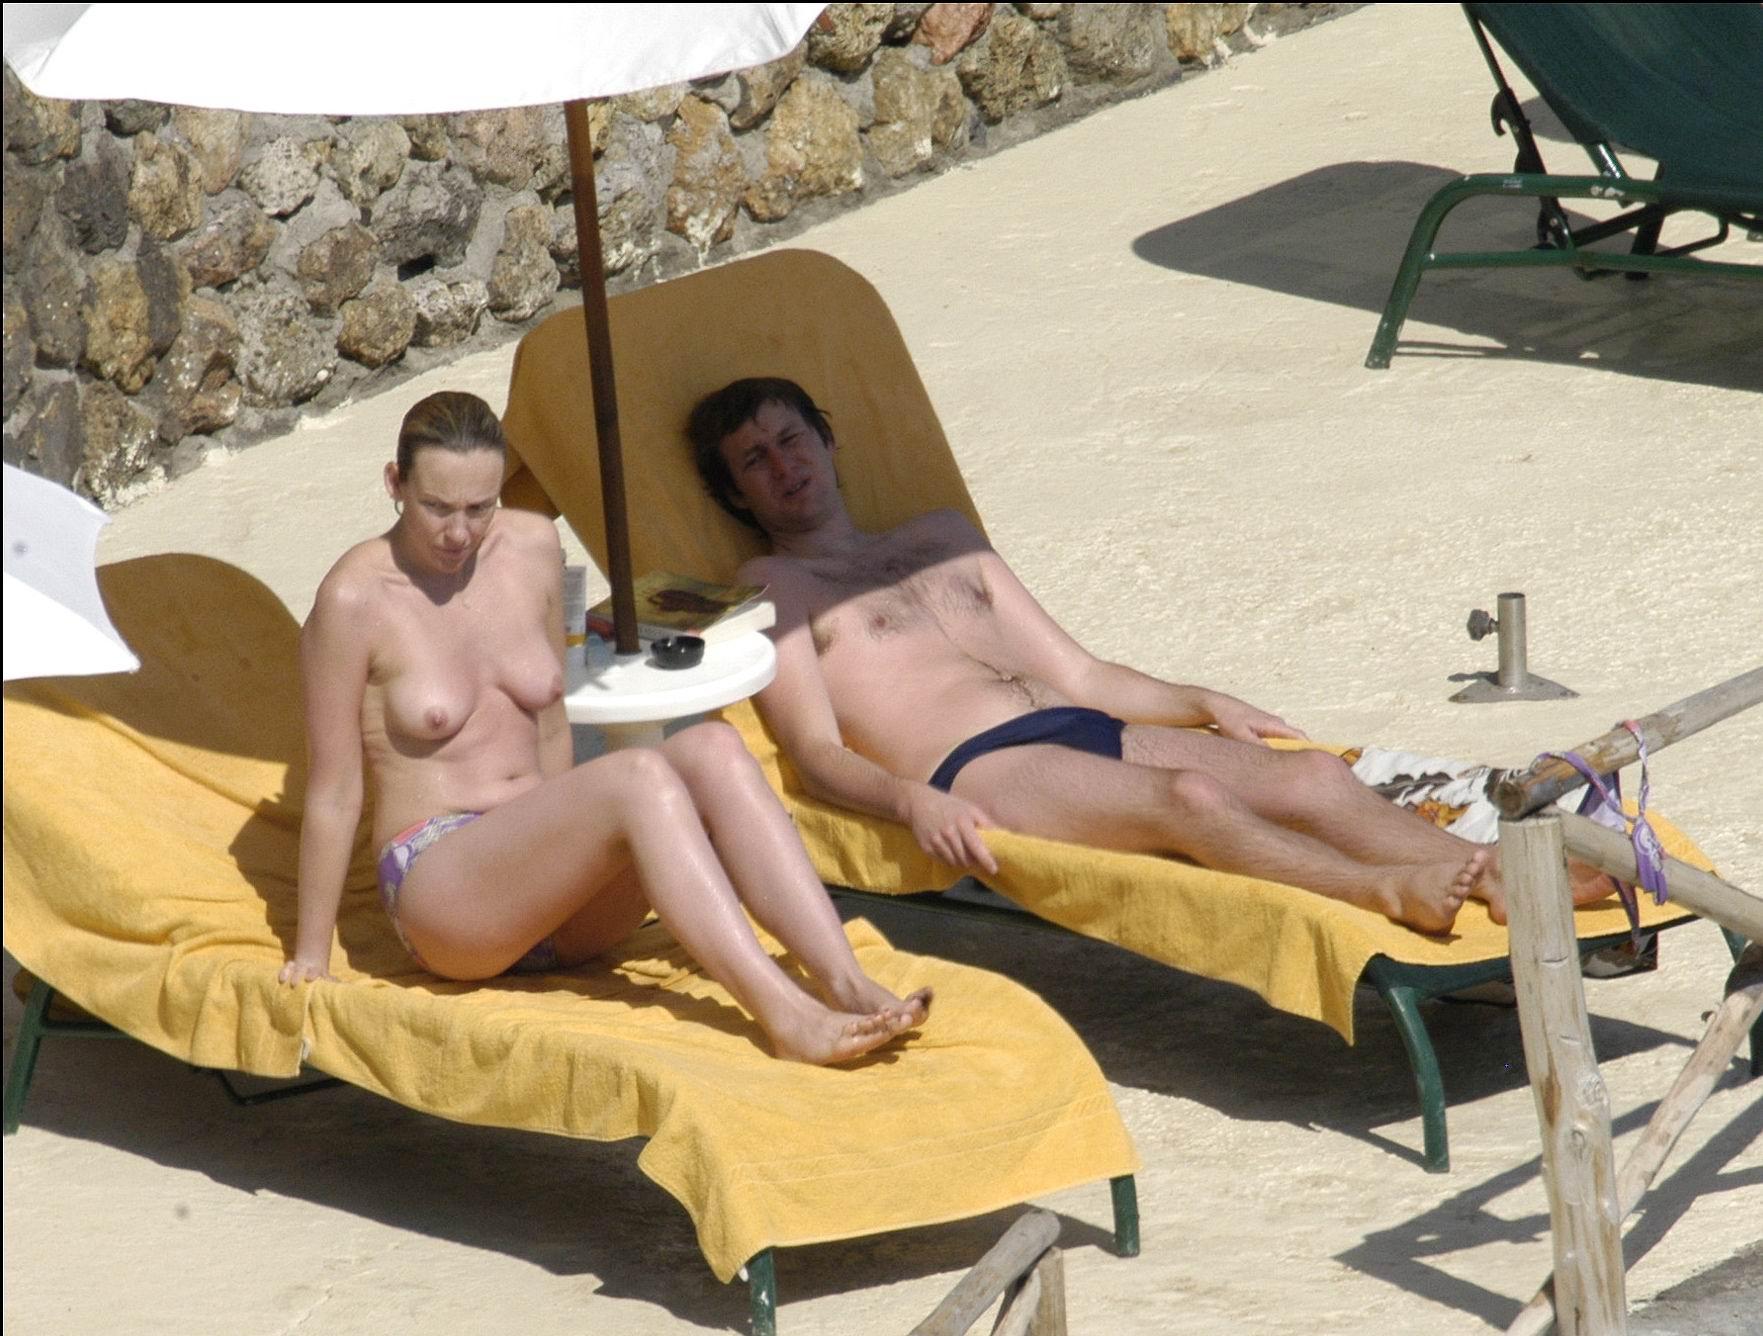 Toni Collette Desnuda Página 3 Fotos Desnuda Descuido Topless